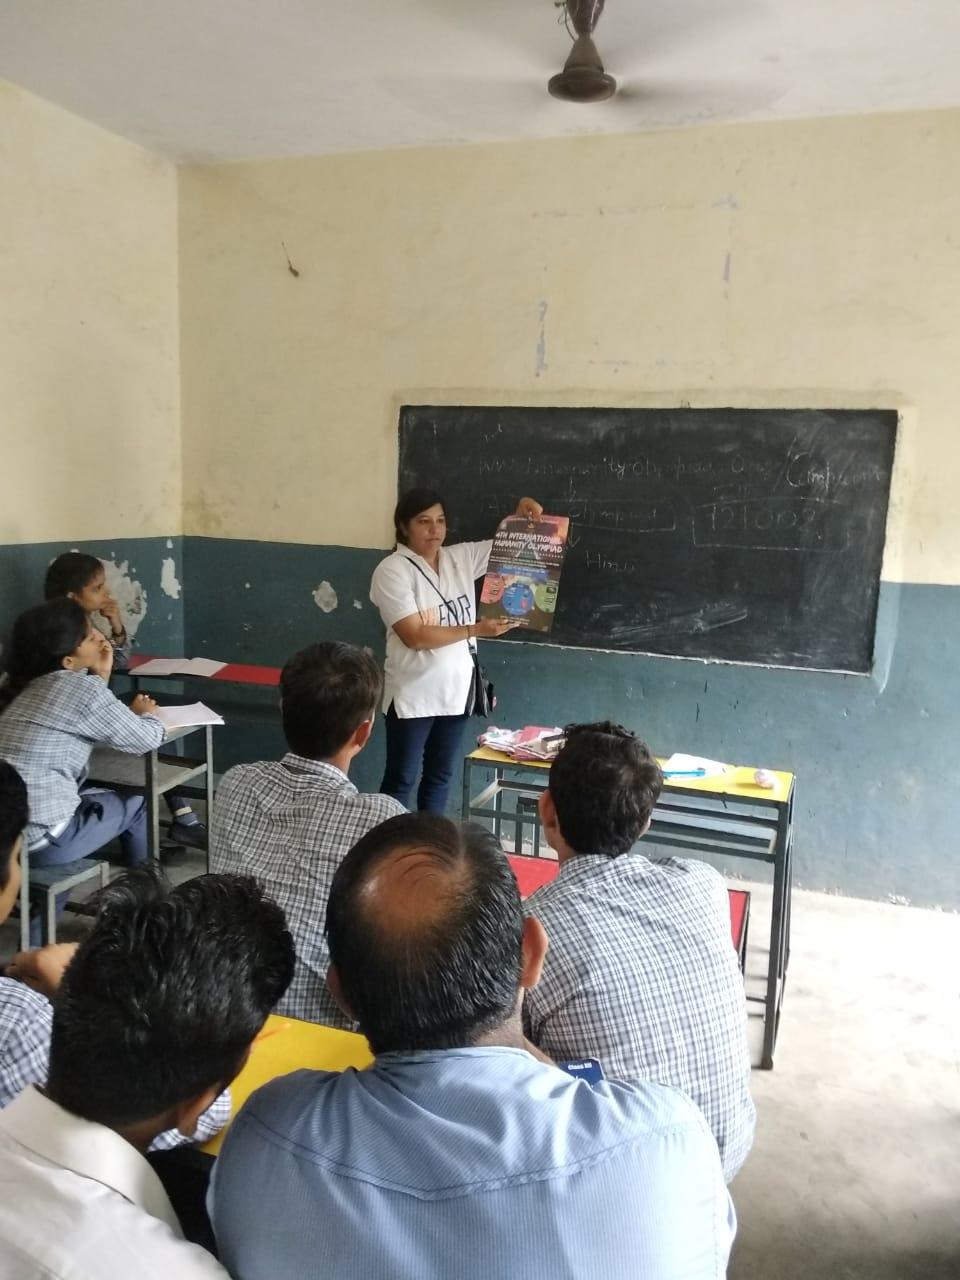 Abvk sr sec school sec 29 Faridabad.jpeg